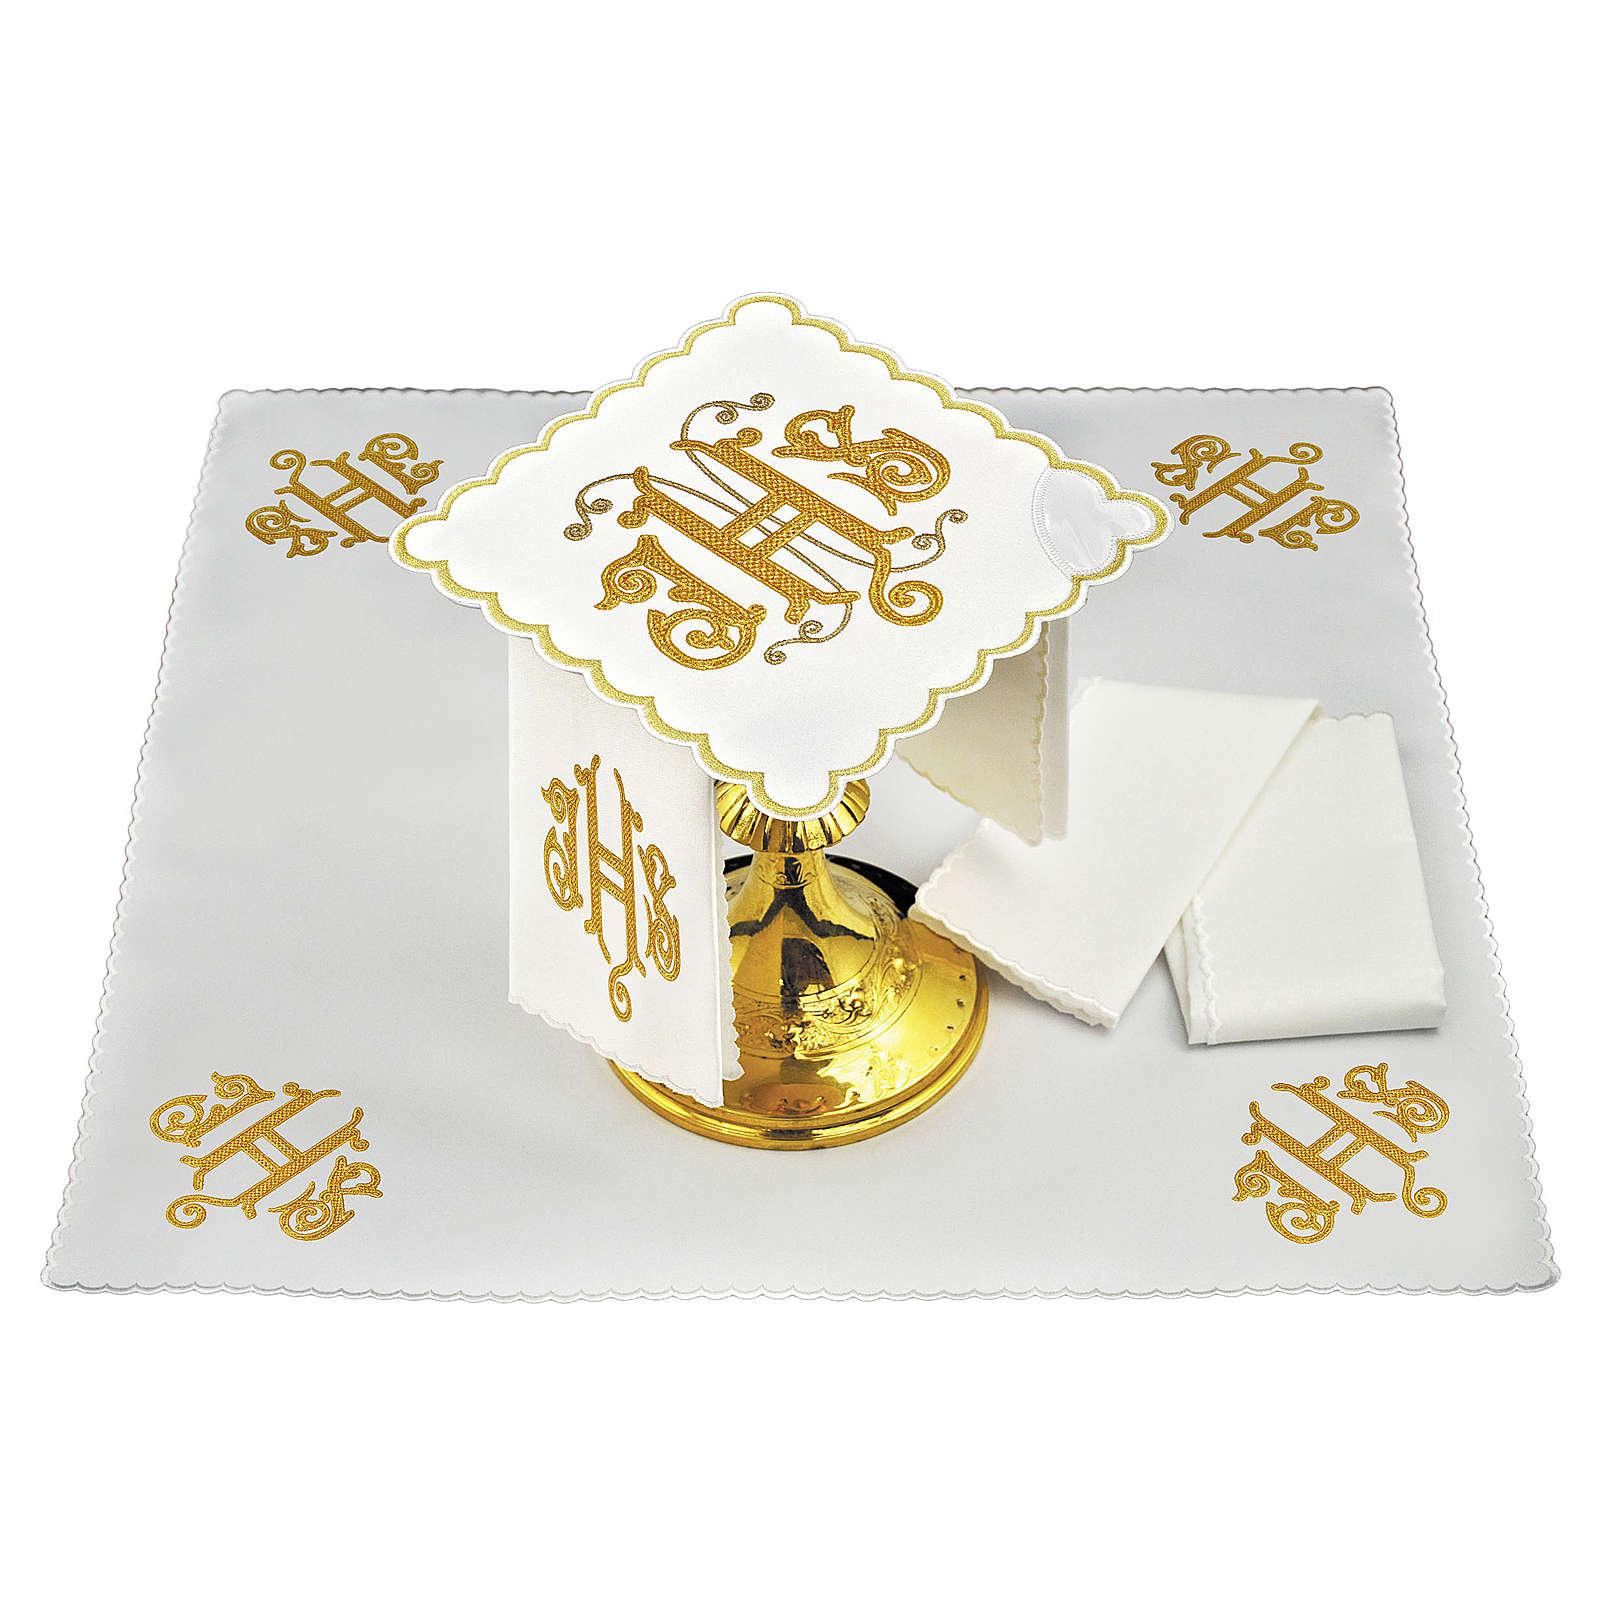 Altar linen JHS embroidery, gold embellished 4